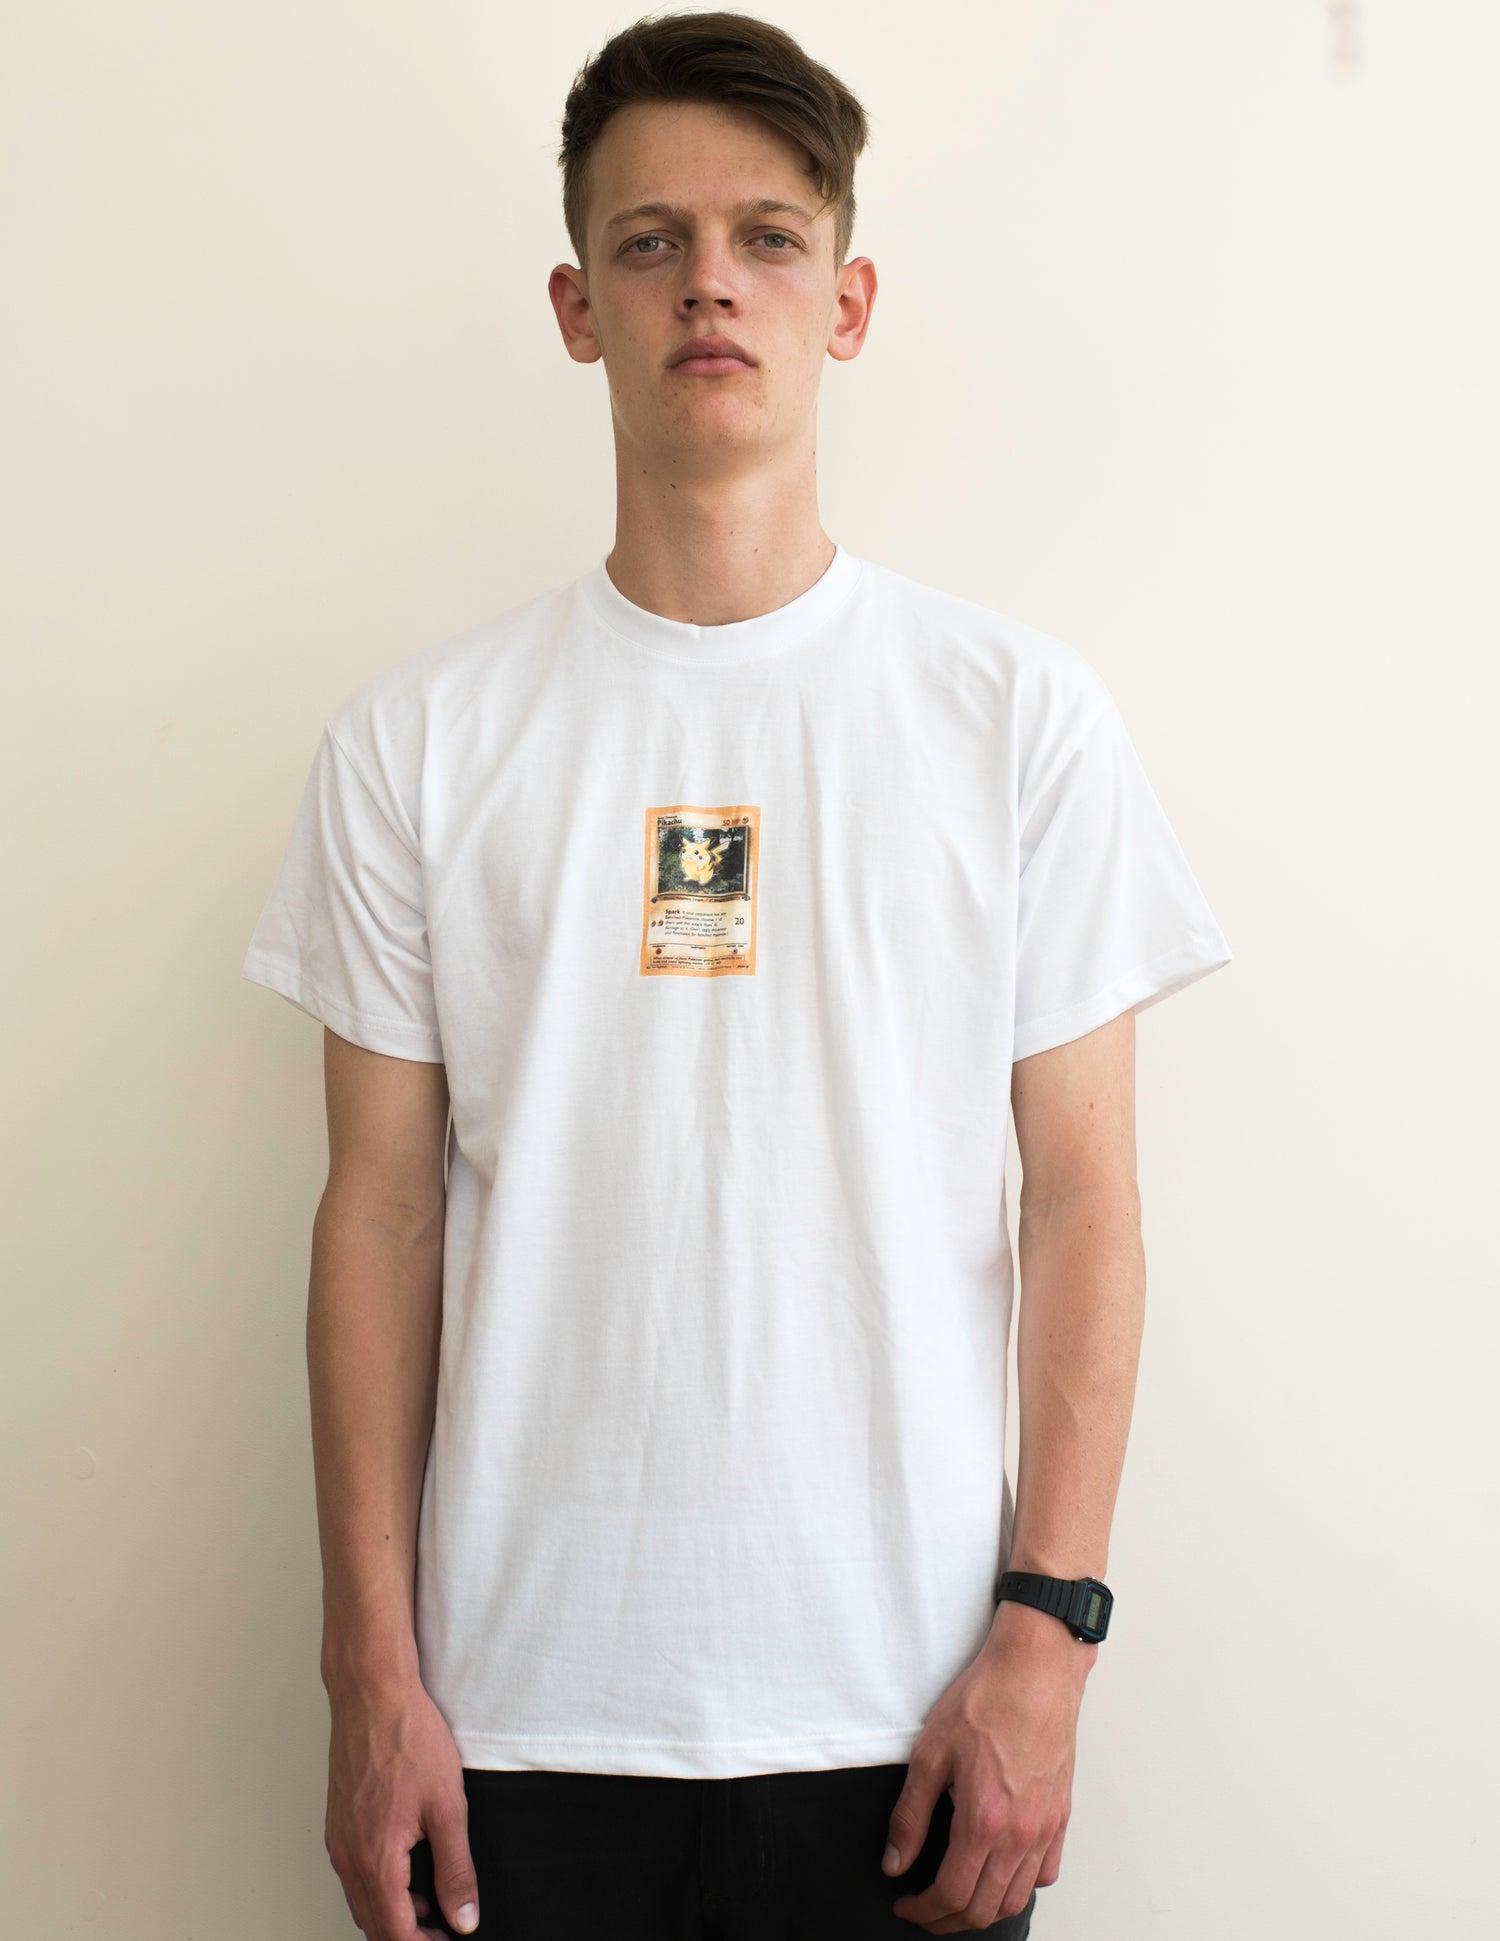 Image of Pikachu T-shirt